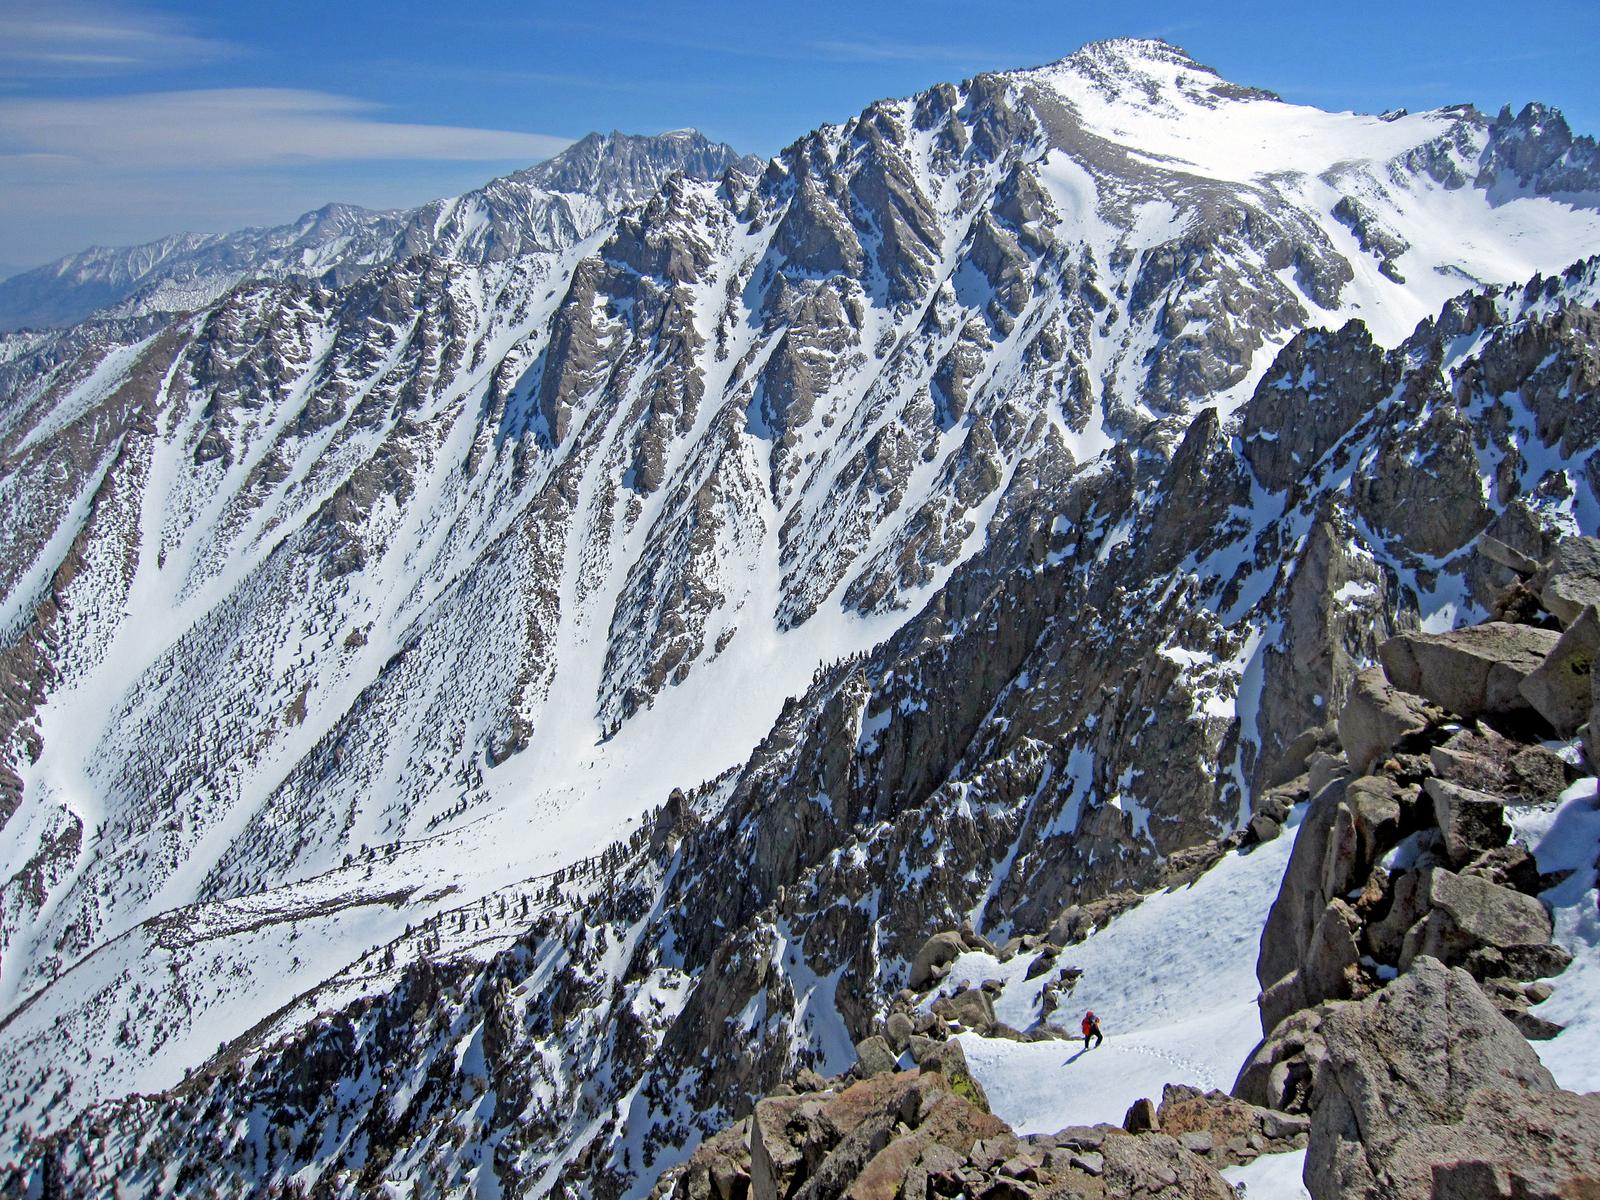 with the massive bulk of Mt. Williamson behind - eastern Sierra, California